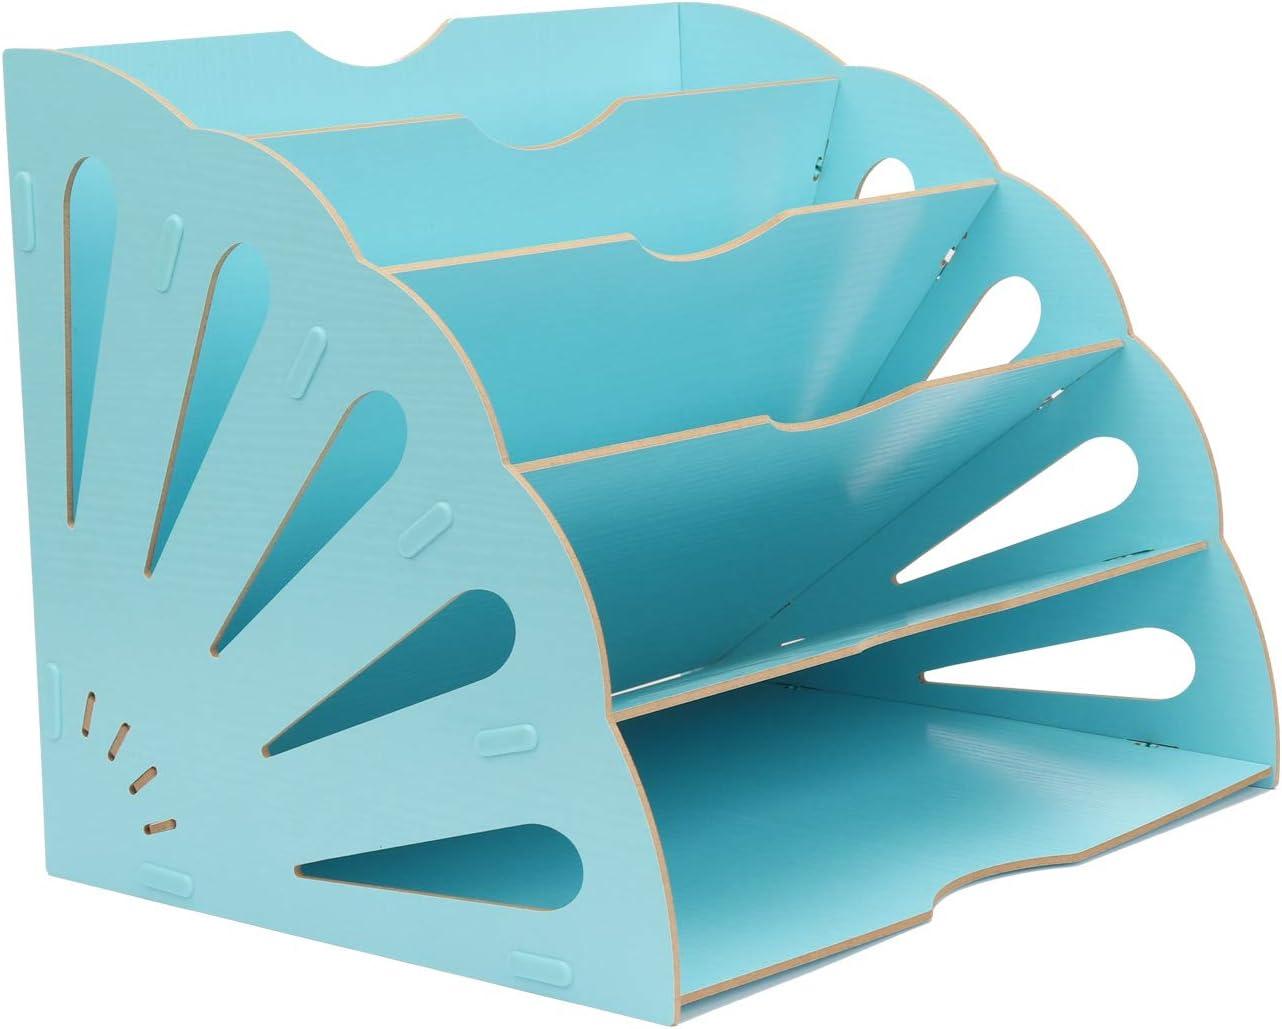 Office 5 Sections Desktop Inclined File Document Sorter Organizer Desk Organizer for Home Office Students DIY Organization, Buckle Design Fan-Shaped Wooden Assembly Folders, Light Blue